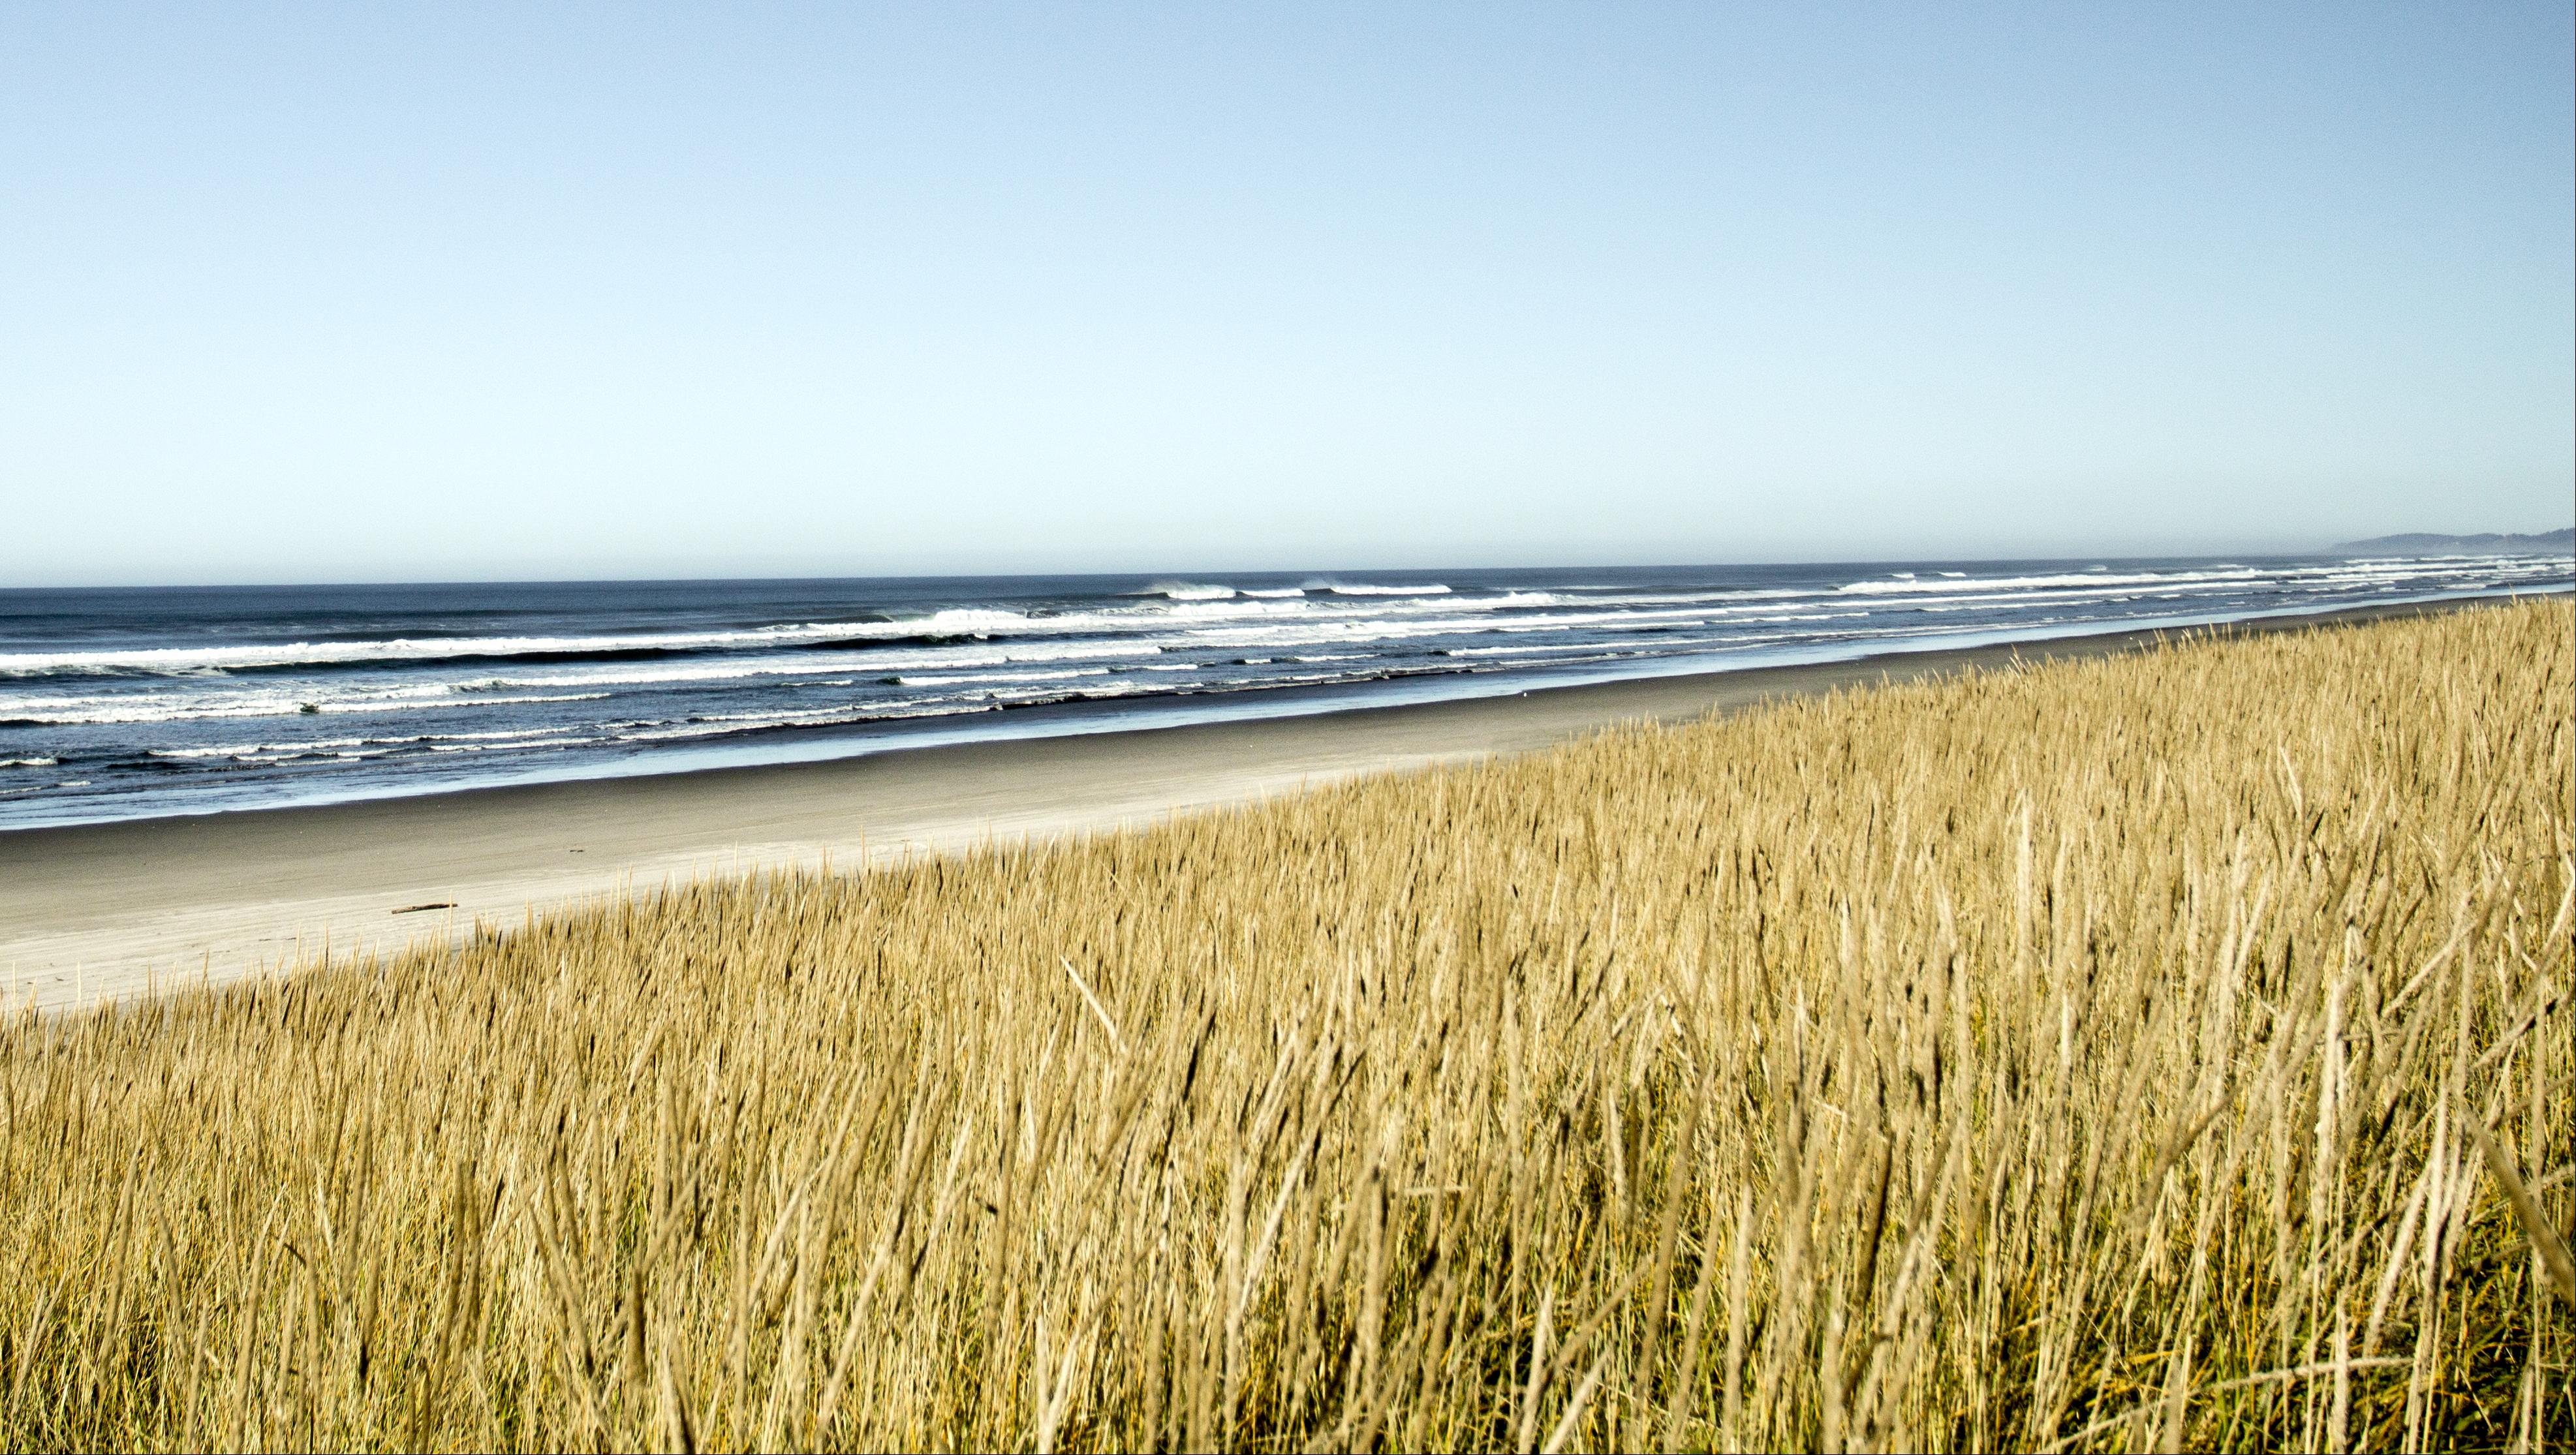 Sunset Beach, Oregon, Bay, Beach, Coast, Grass, HQ Photo